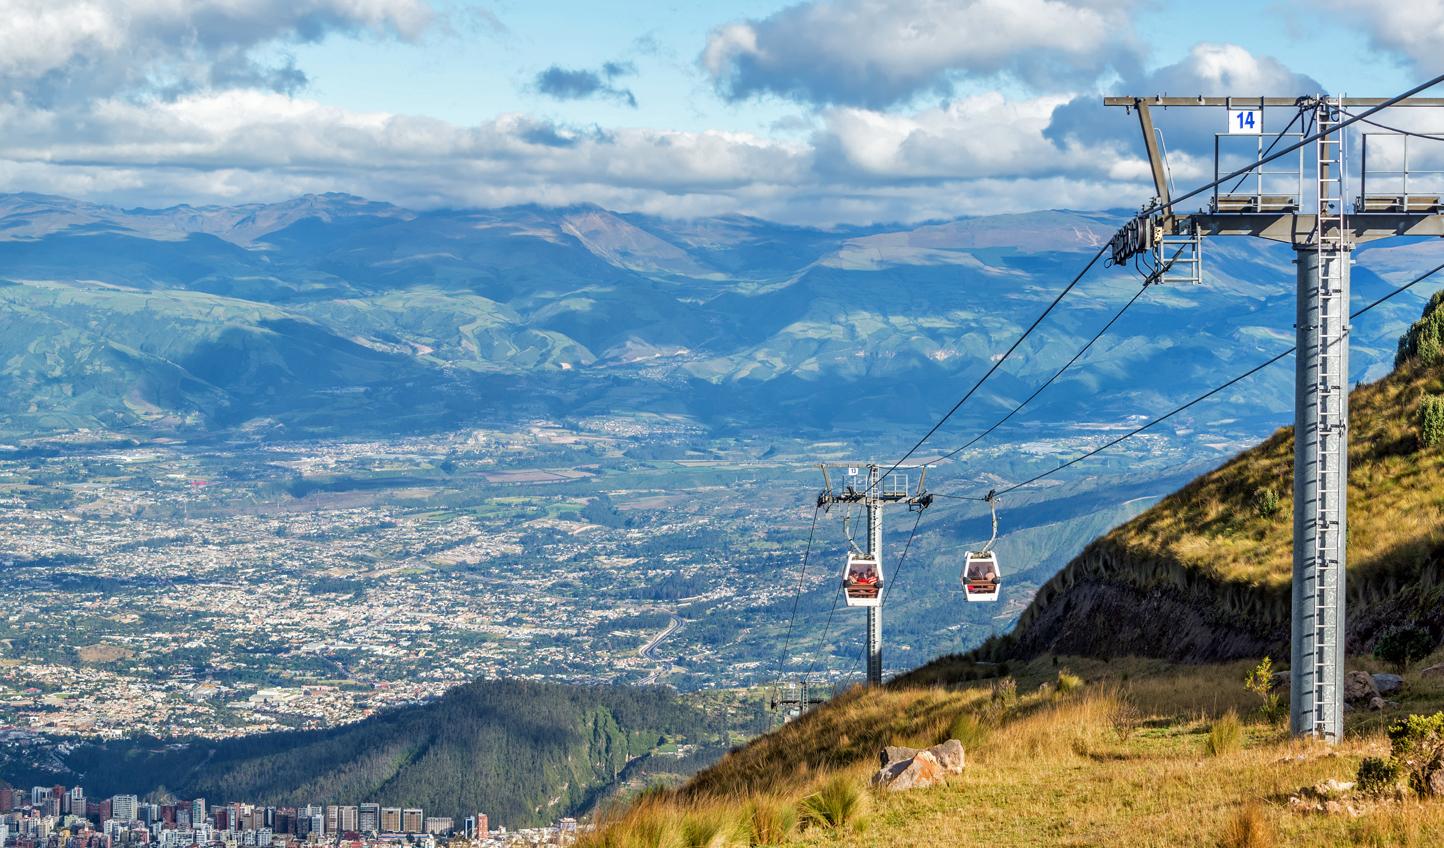 Enjoy the ride on the Teleférico Cable Car